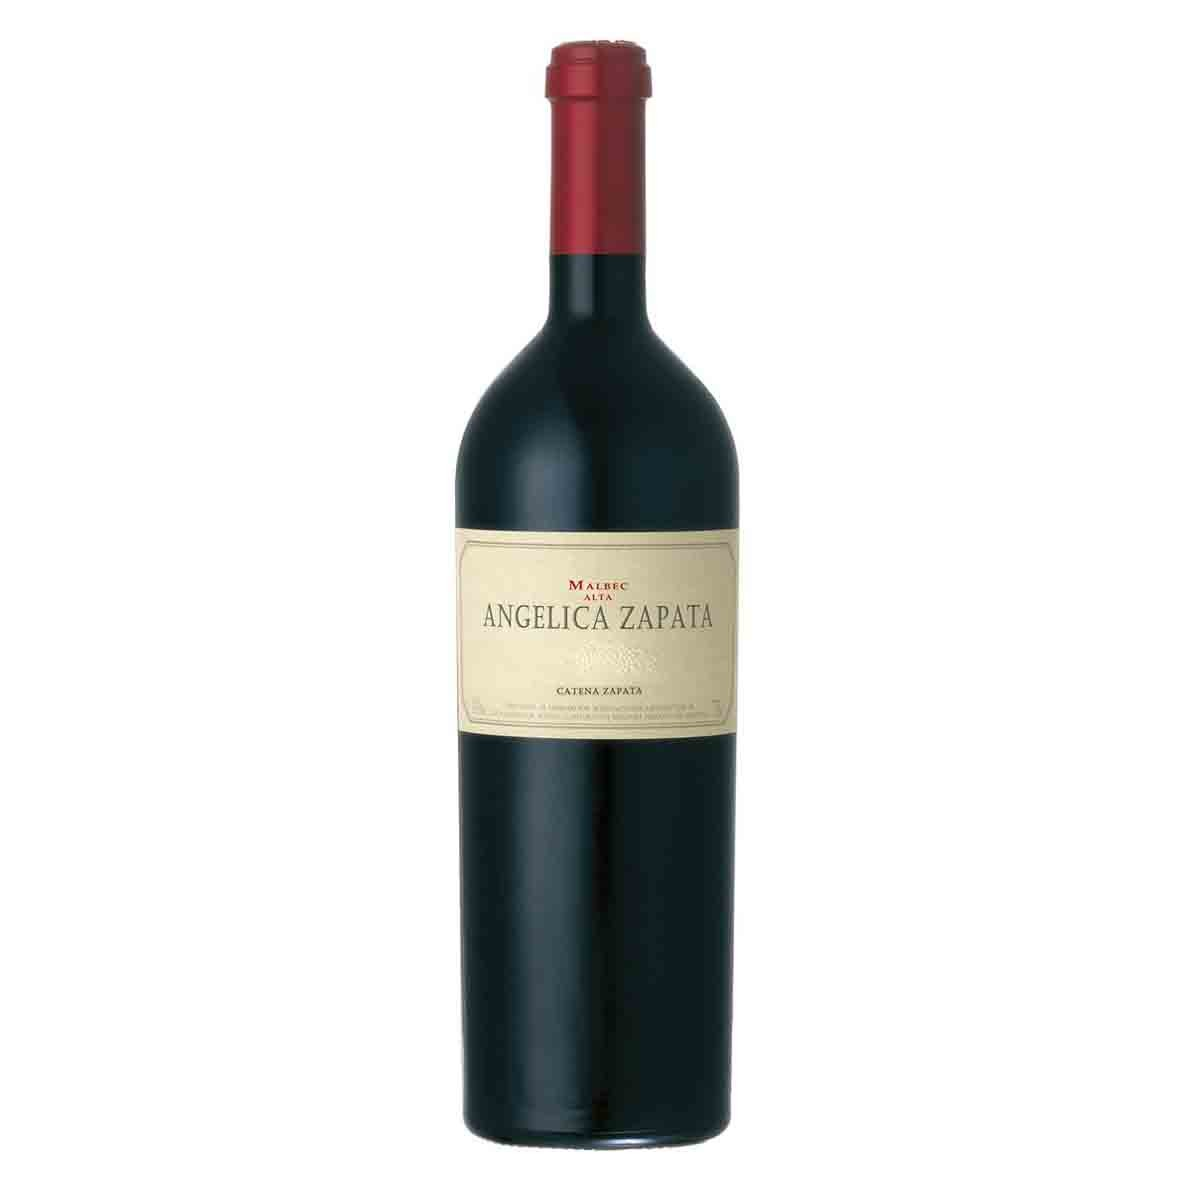 Vinho Argentino Tinto Angelica Zapata Malbec 2015 750ml